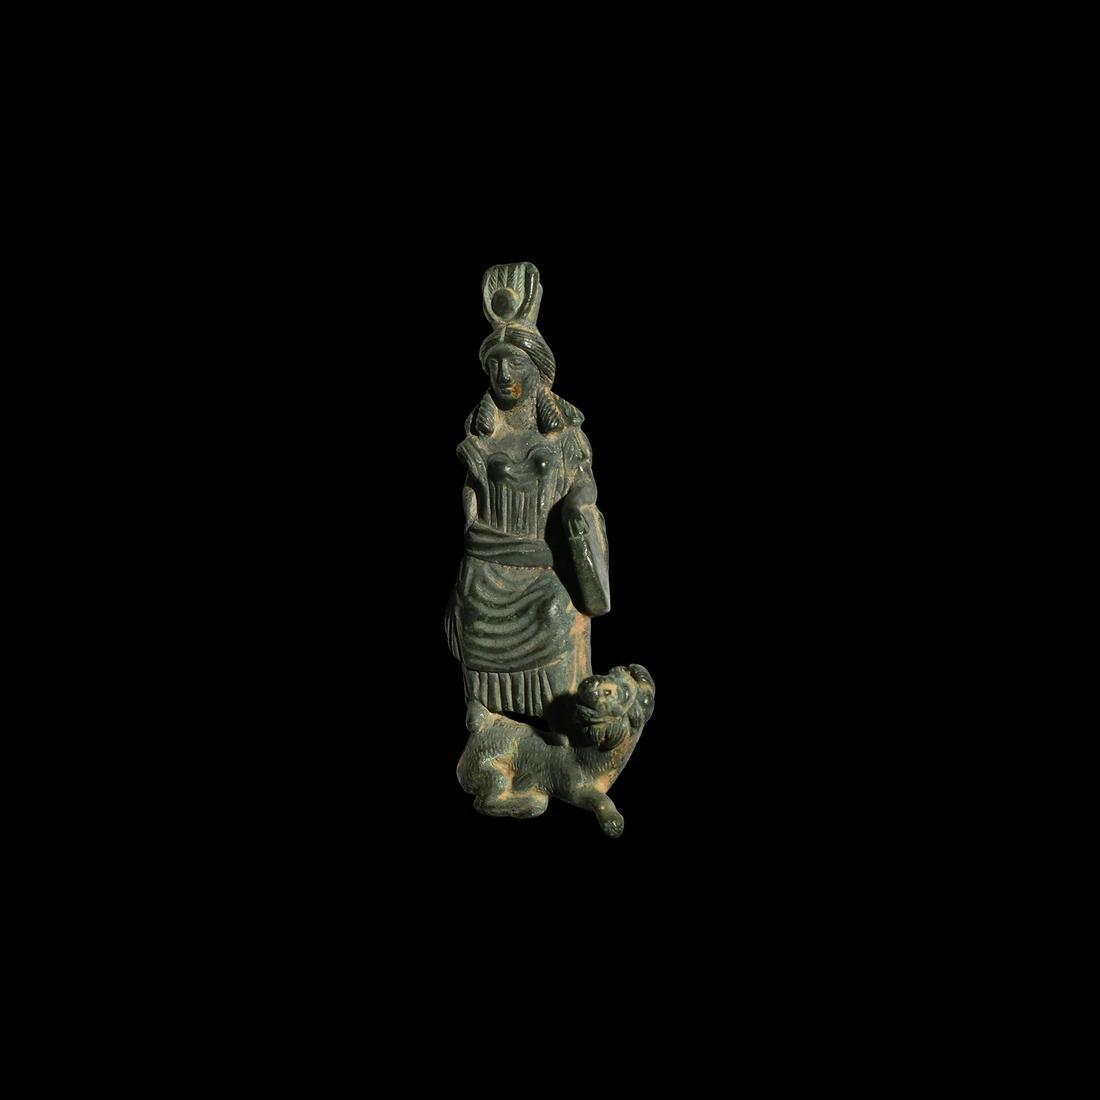 Romano-Egyptian Goddess Statuette Standing on Lion